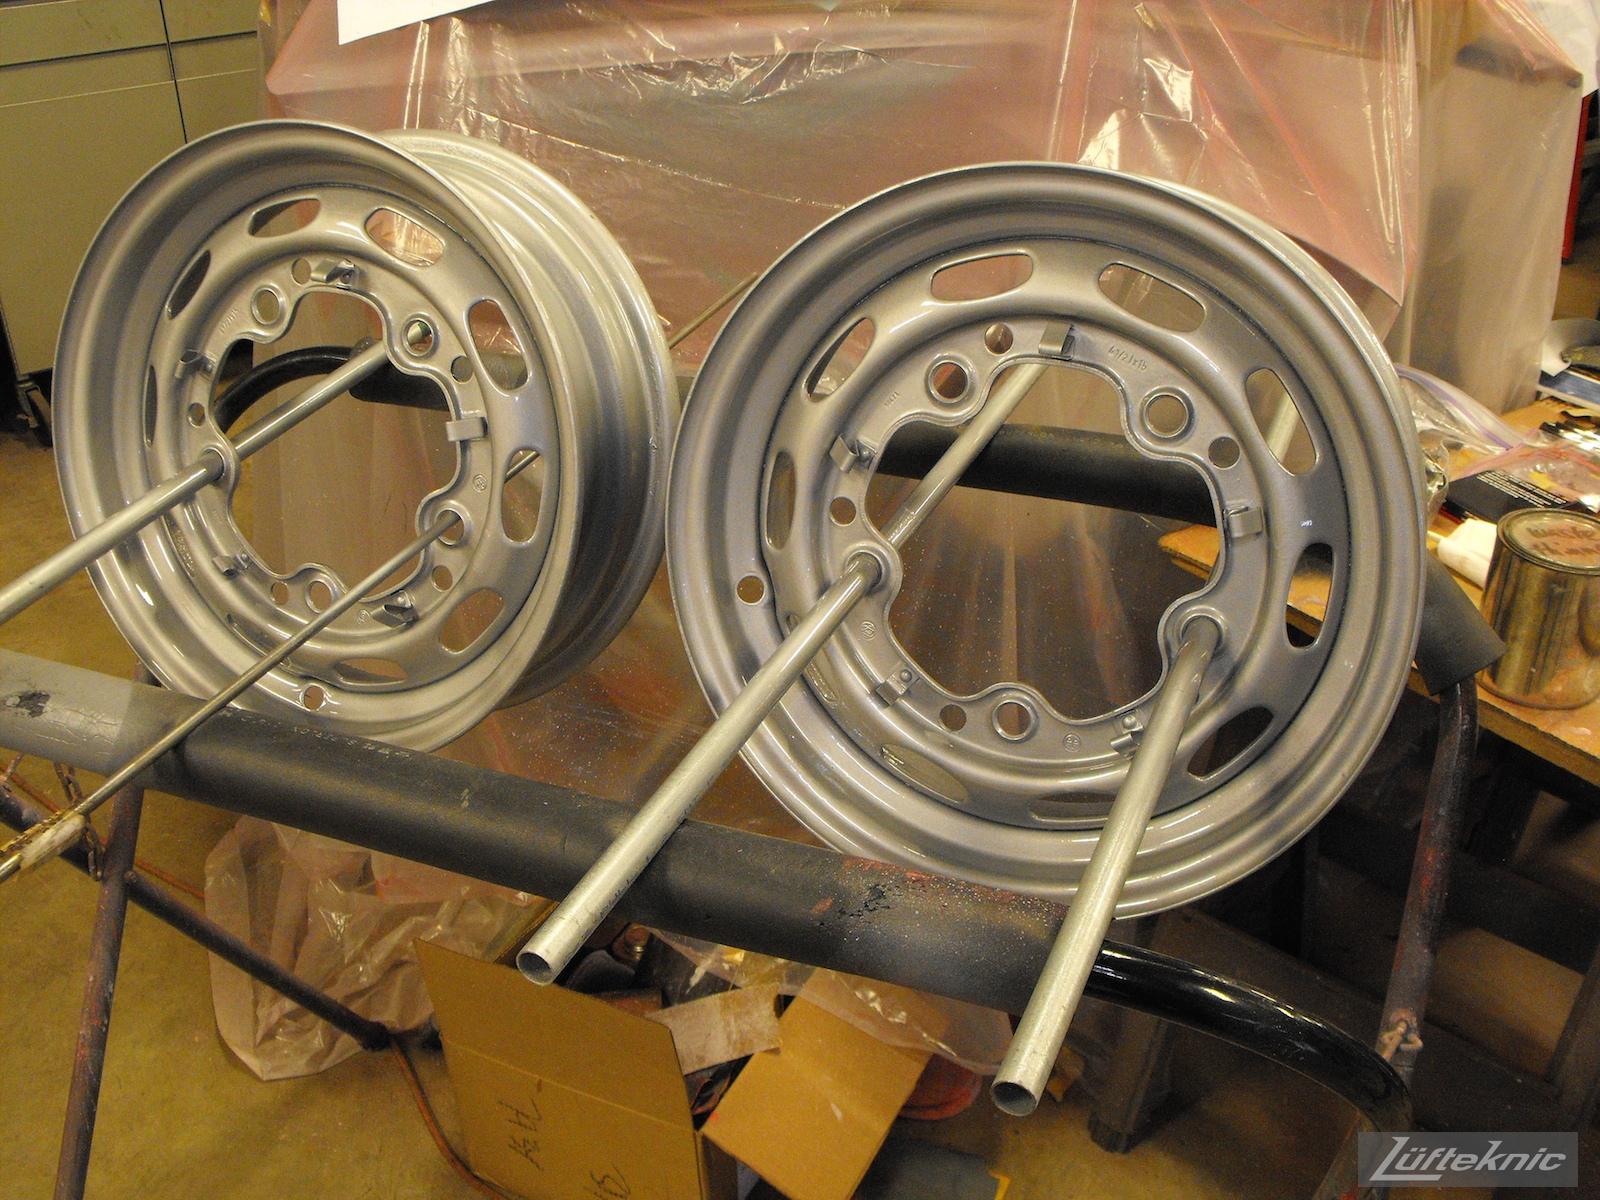 Freshly painted wheels on a 1961 Porsche 356B Roadster restoration.